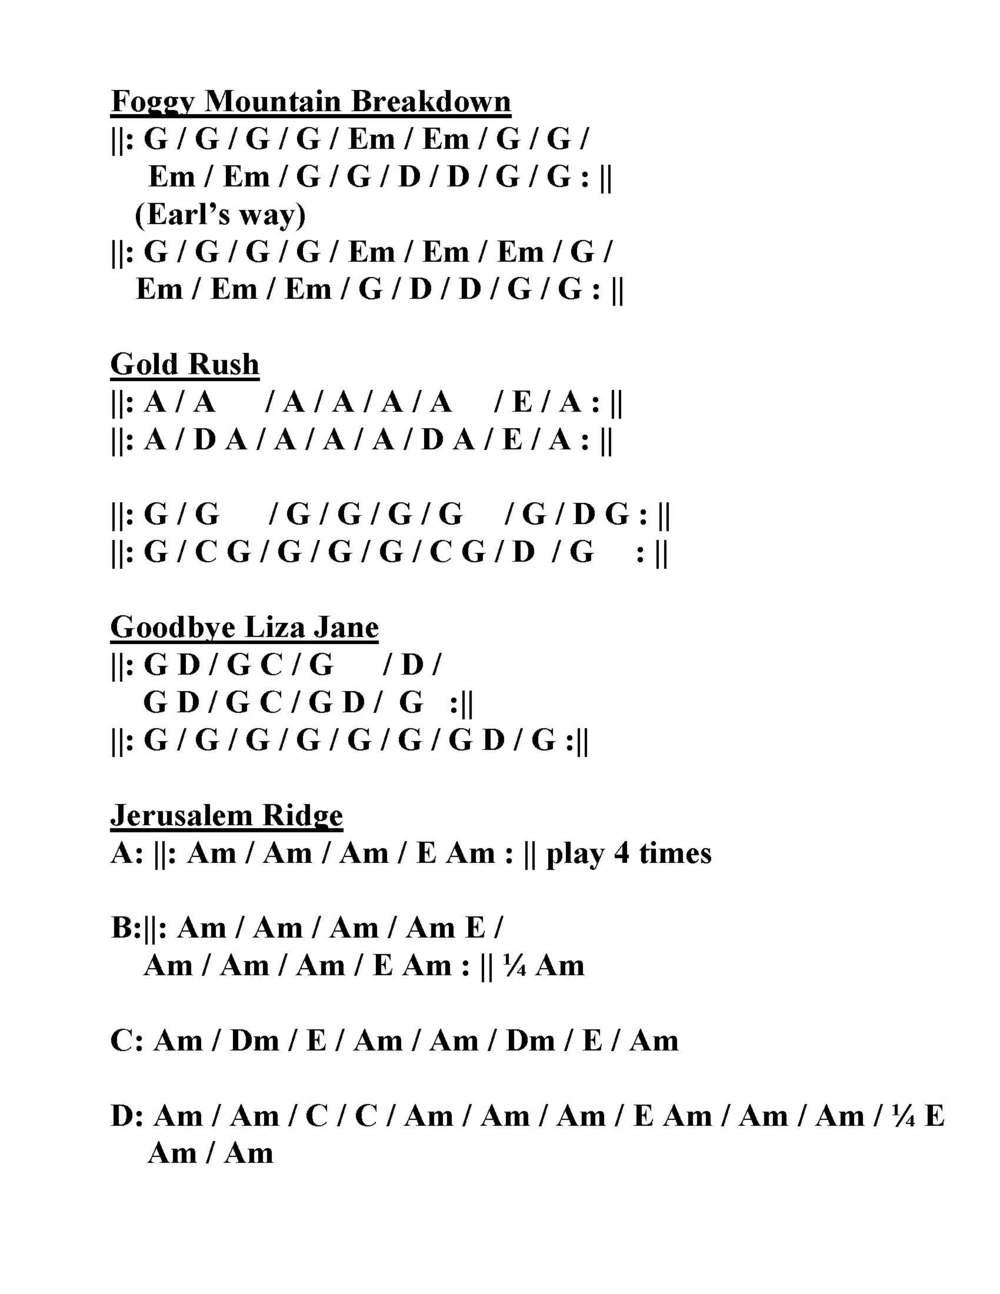 Jam instrumental chord progressions_Page_2.jpg